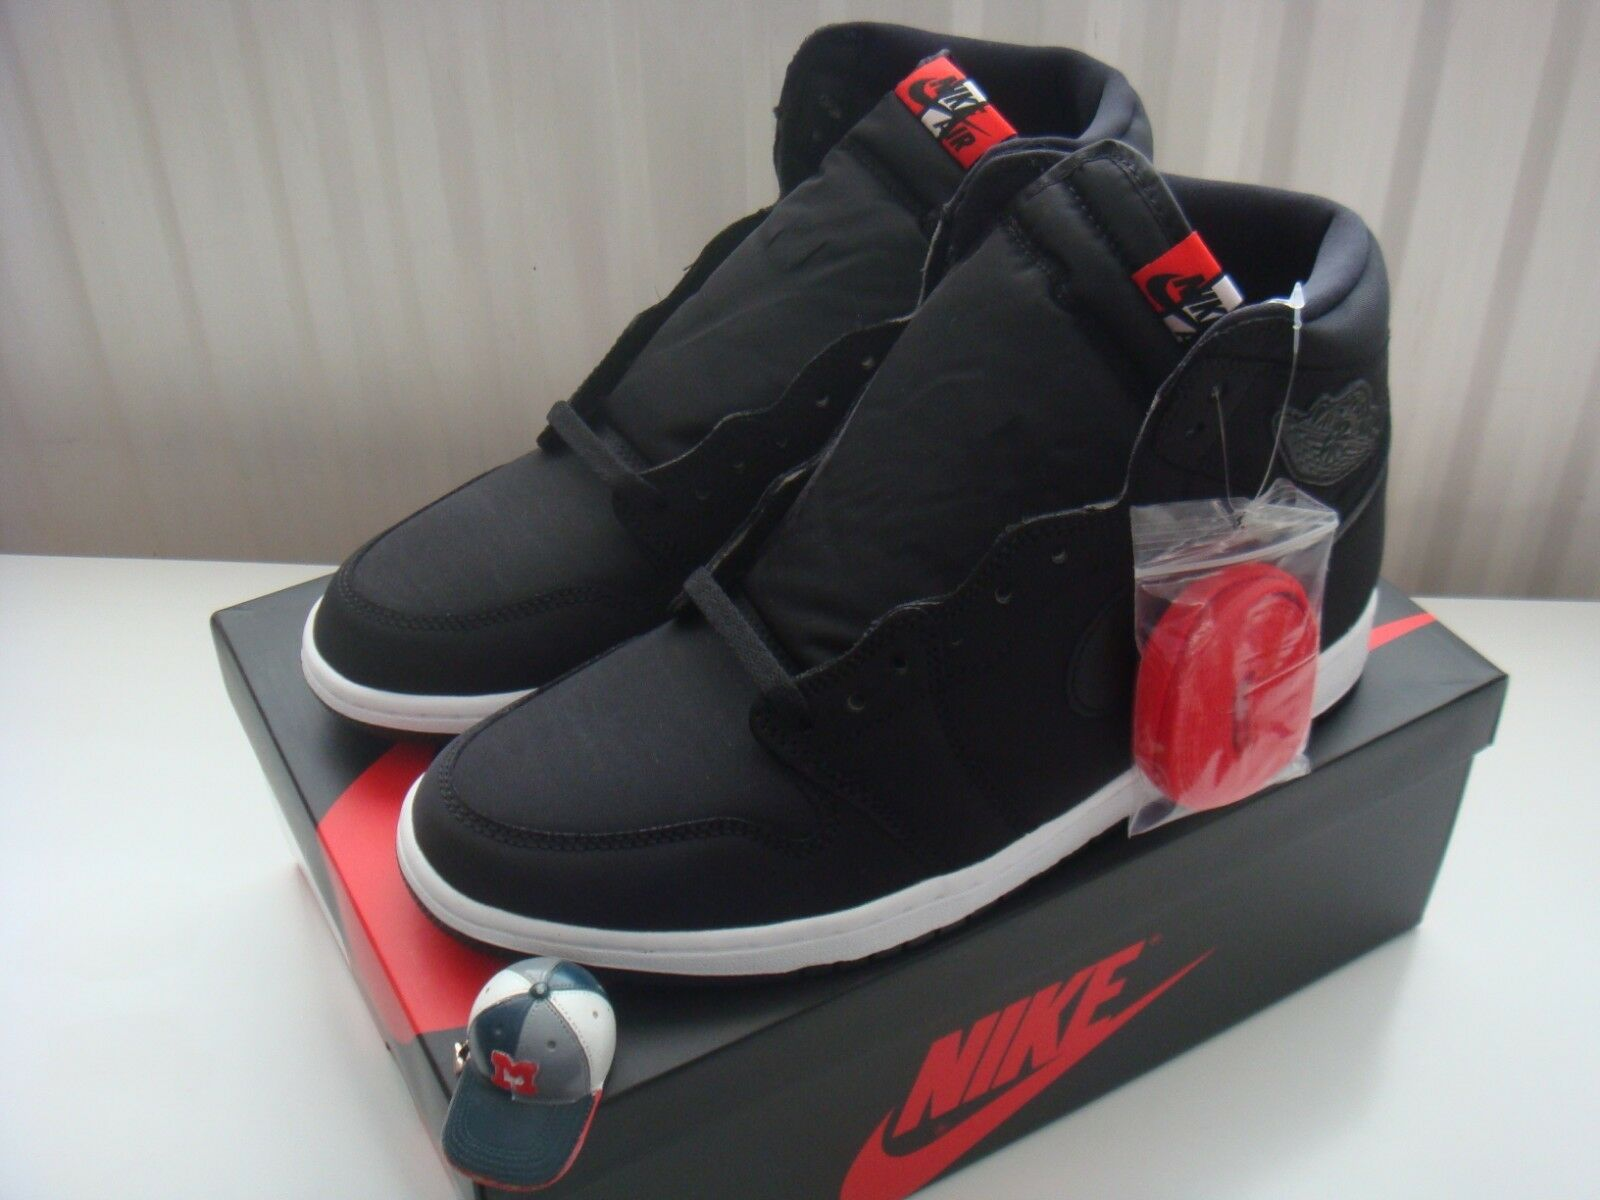 Nike Air Jordan I 1 x PSG US 11.5 UK 10.5 Paris Saint-Germain Union Resale Brot